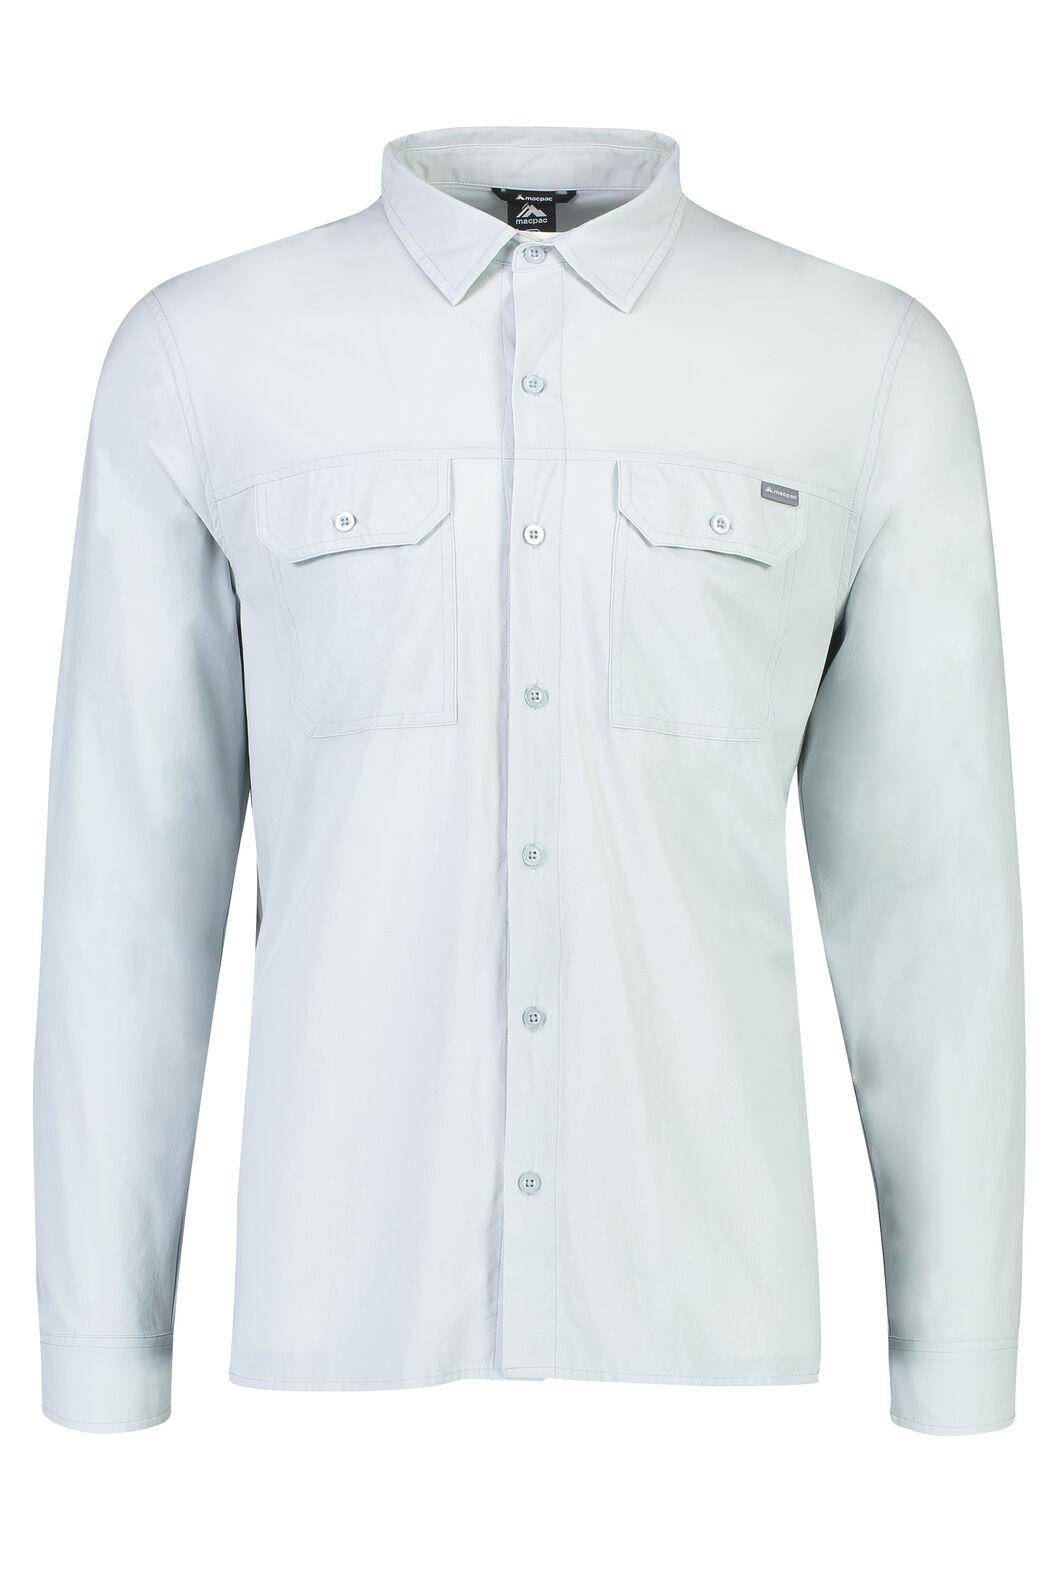 Macpac Eclipse Long Sleeve Shirt - Men's, Pearl, hi-res